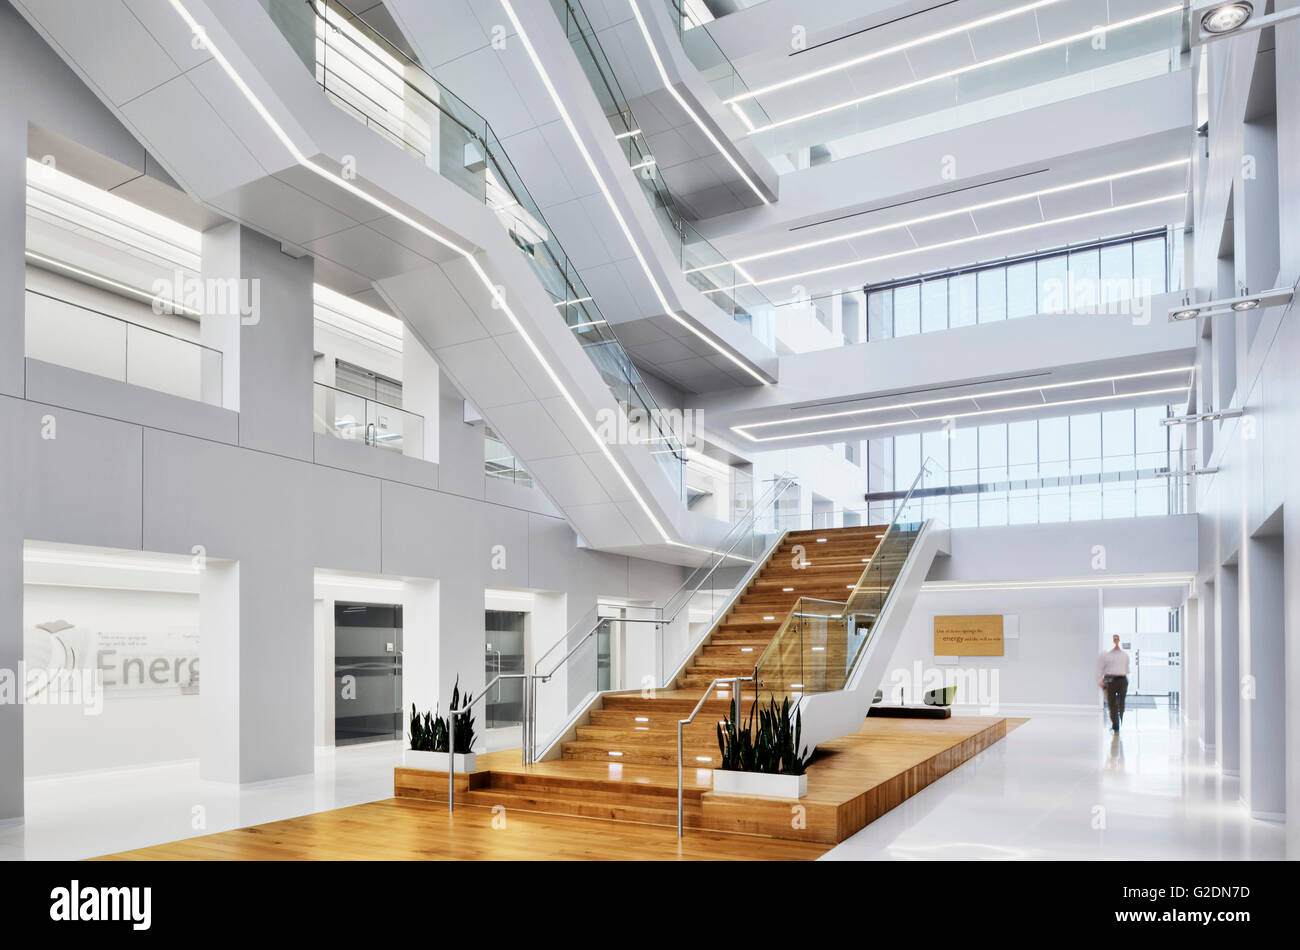 modern office lobby and atrium stock photo 104793569 alamy. Black Bedroom Furniture Sets. Home Design Ideas